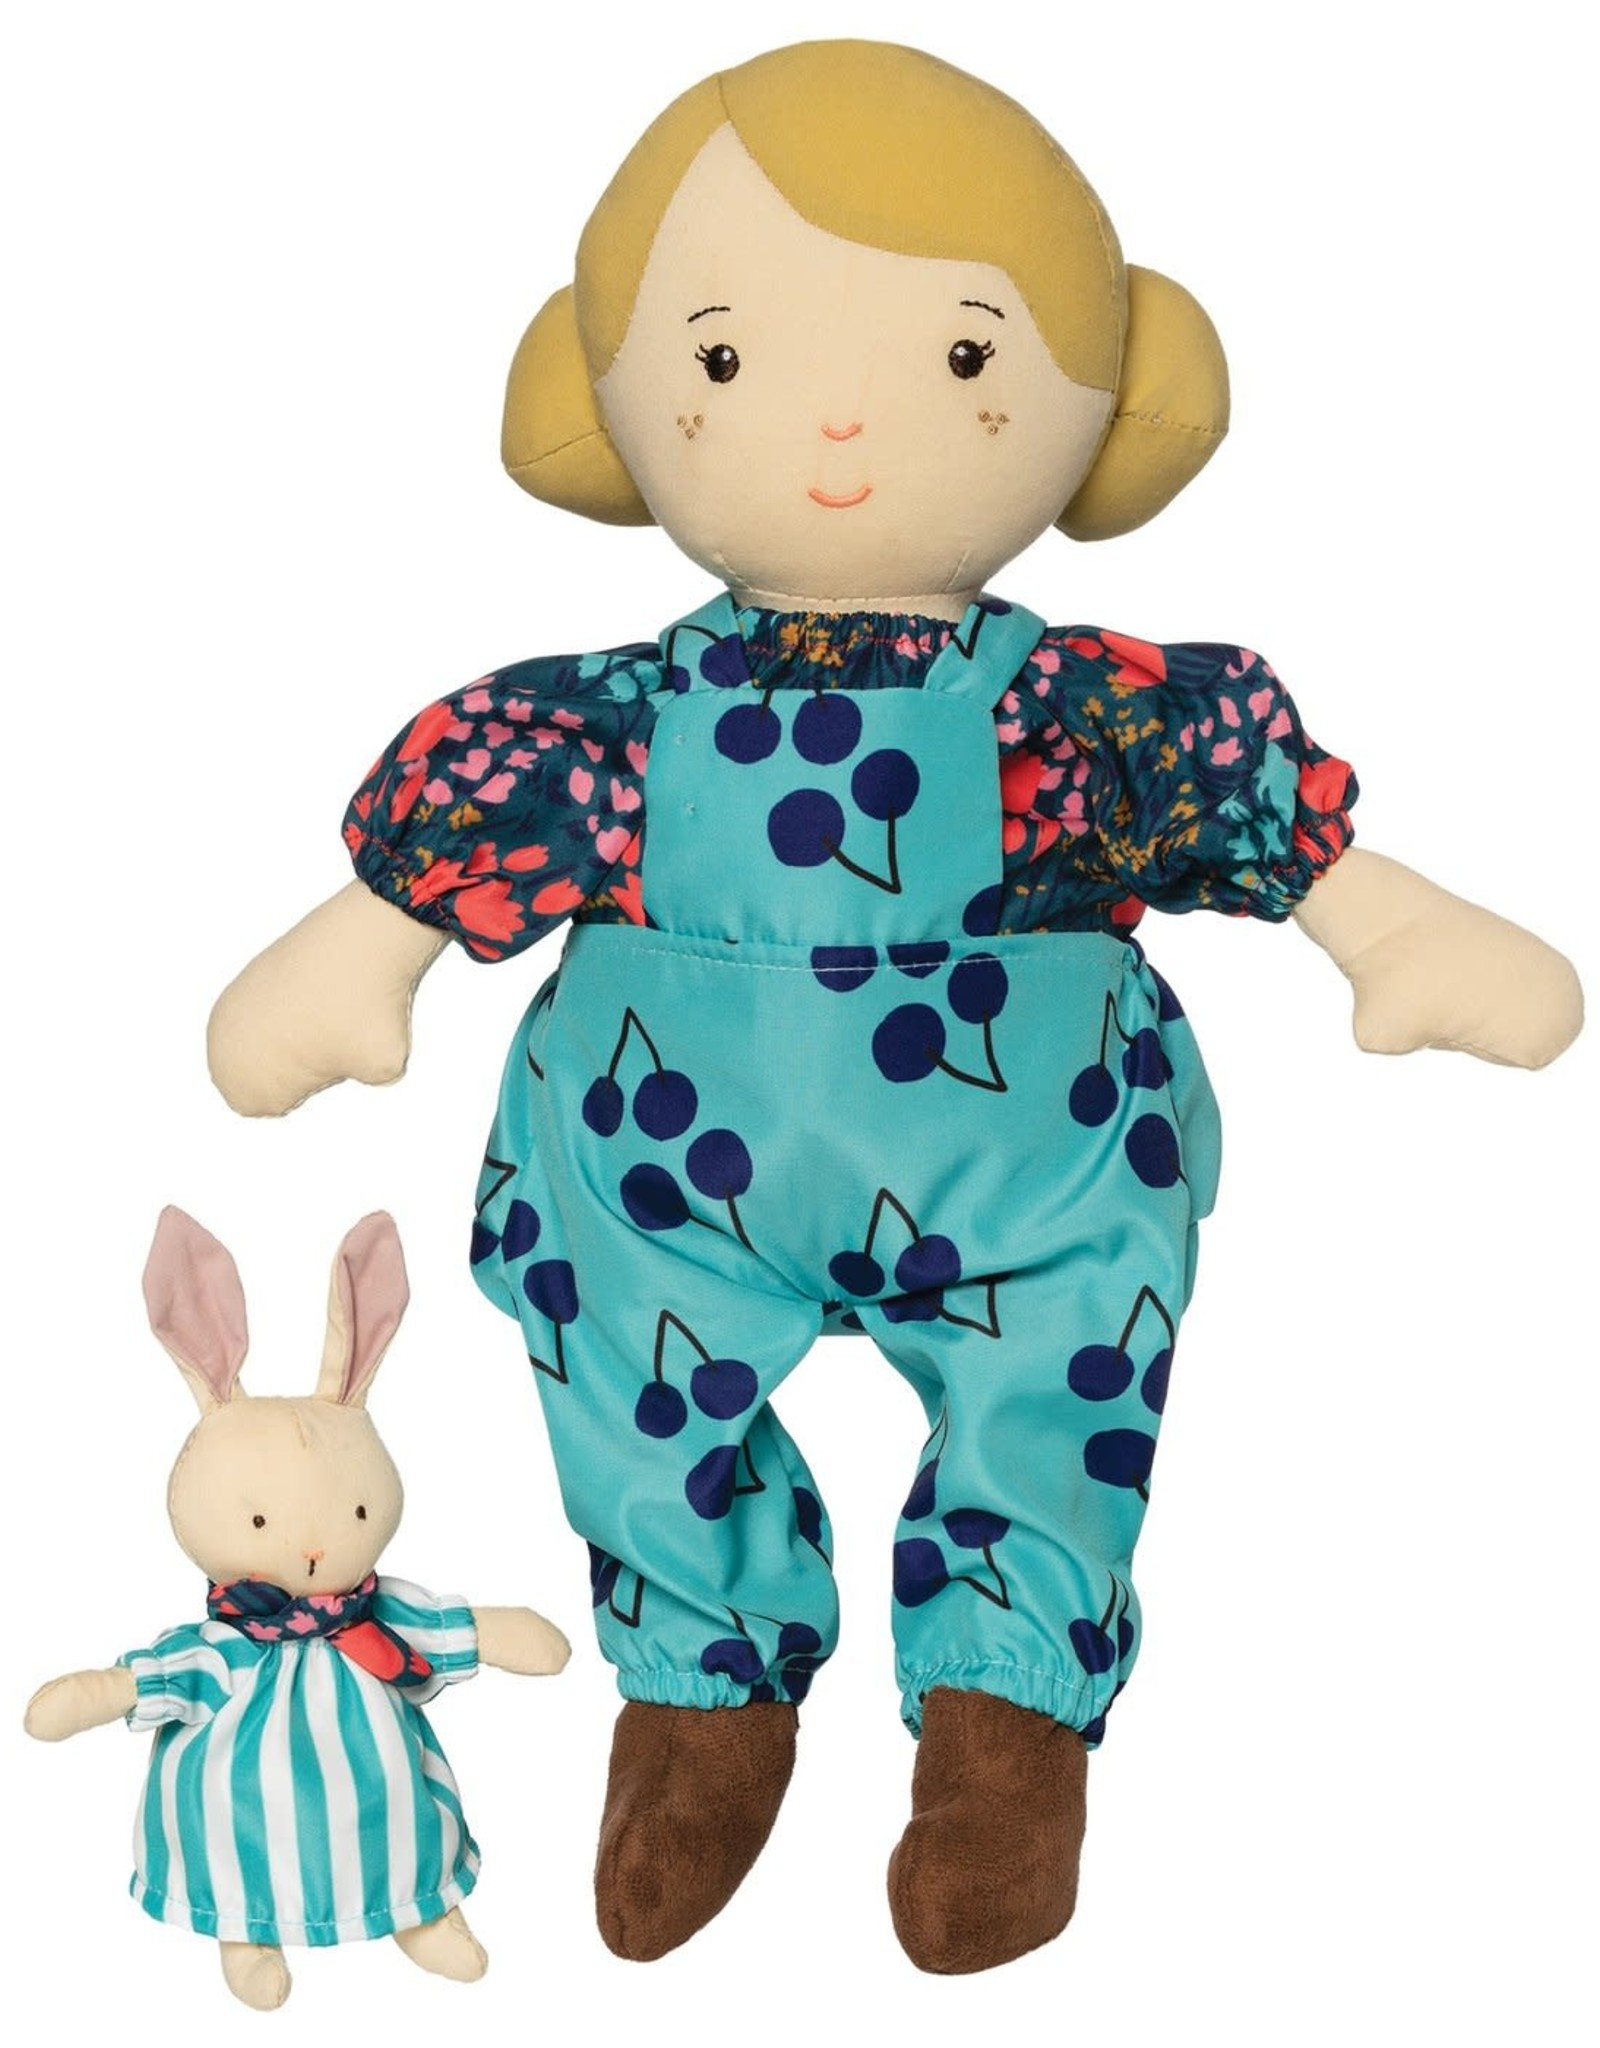 Manhattan Toy Playdate Friends - Ollie (Peach w/bunny)